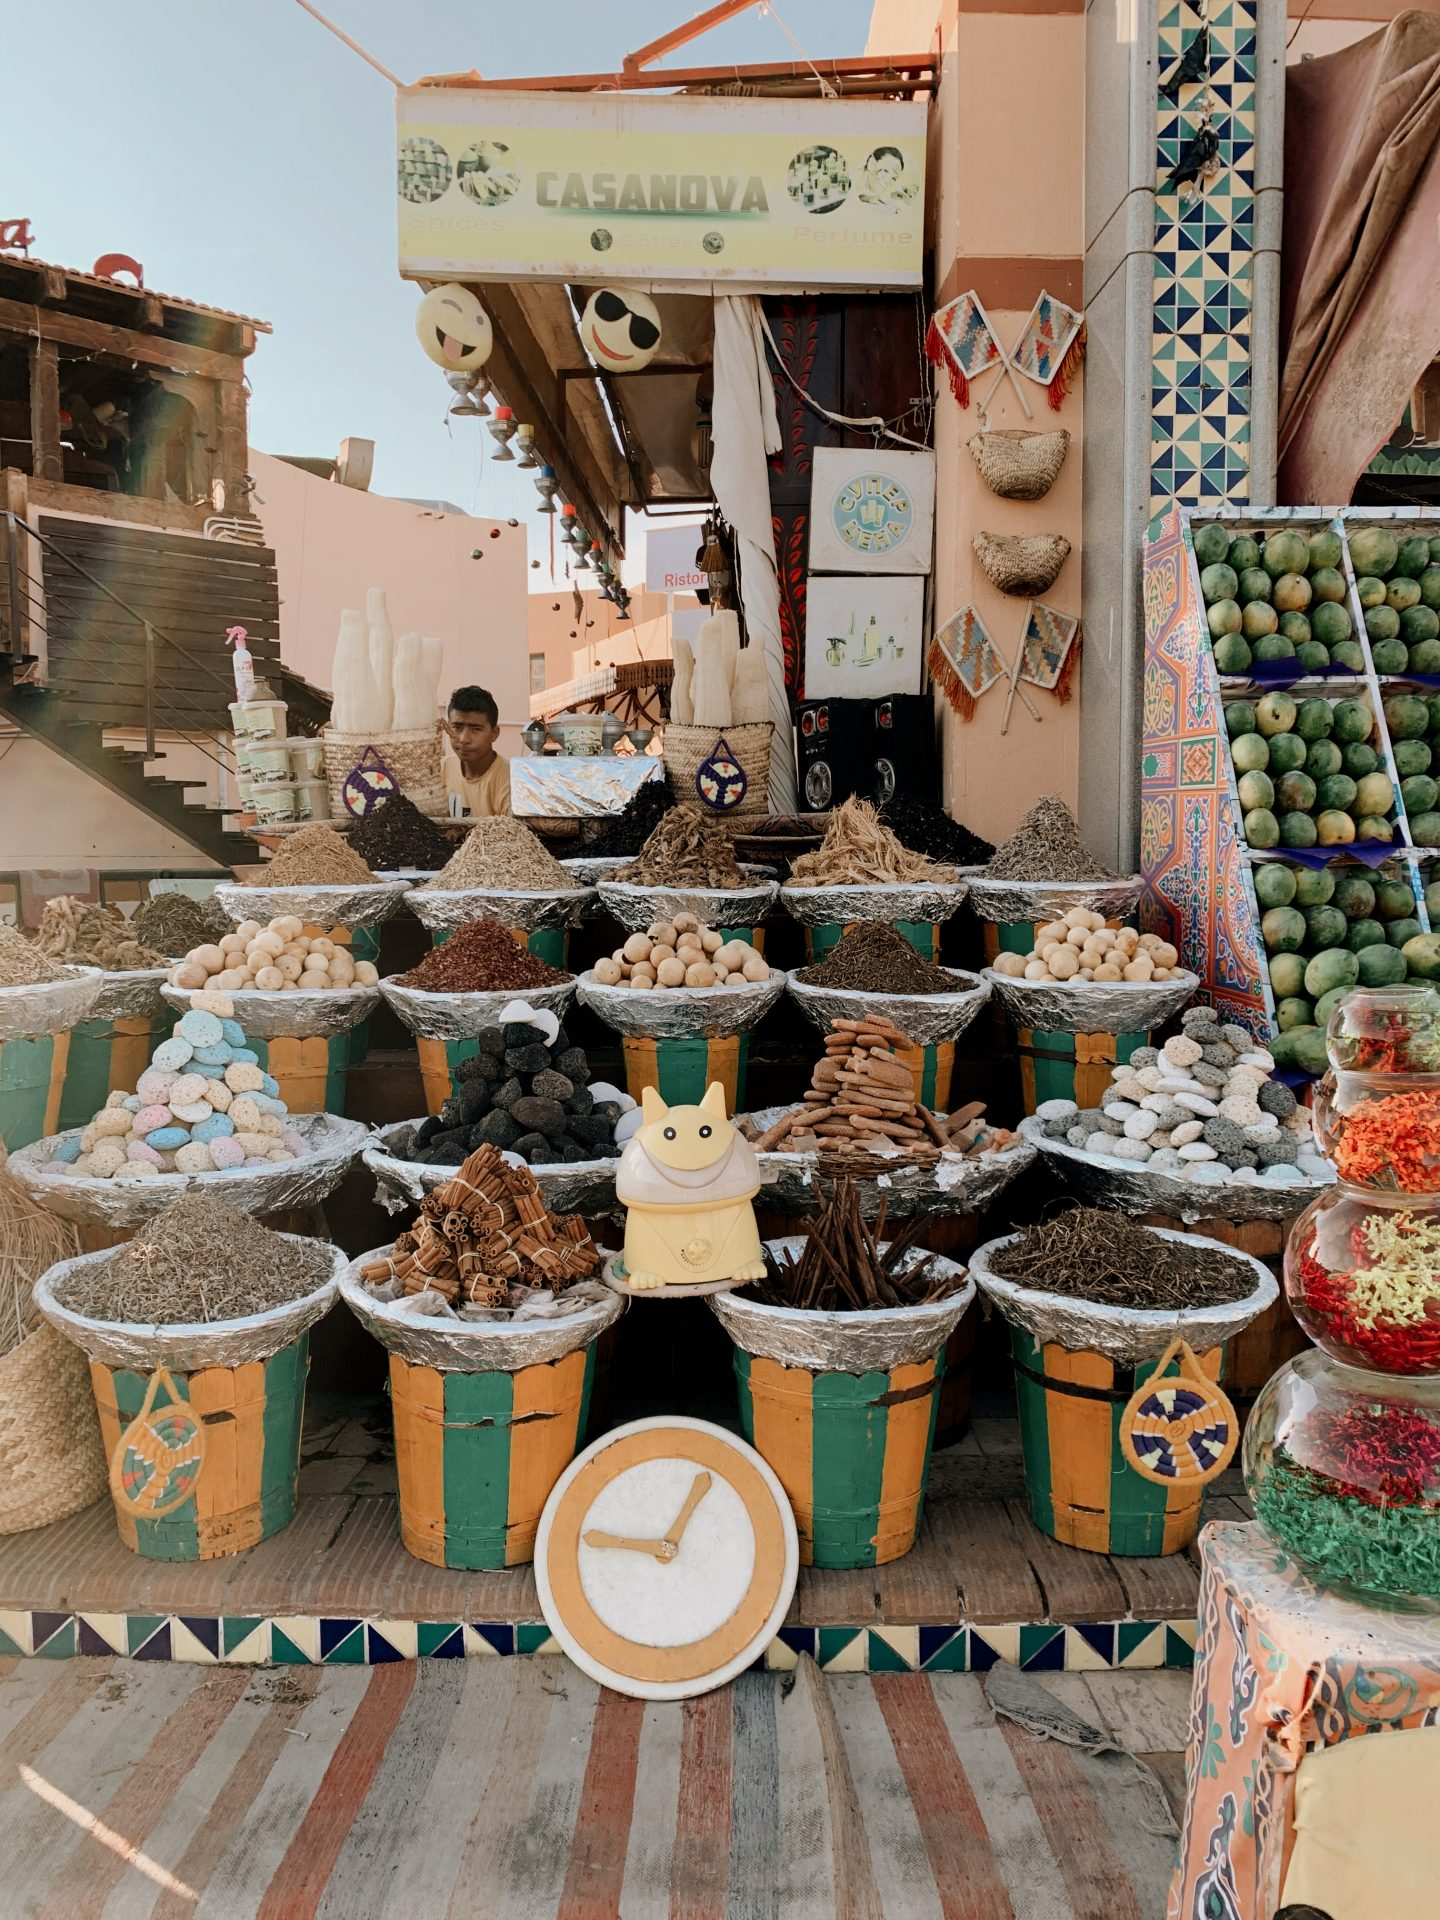 A market in Dahab, Egypt